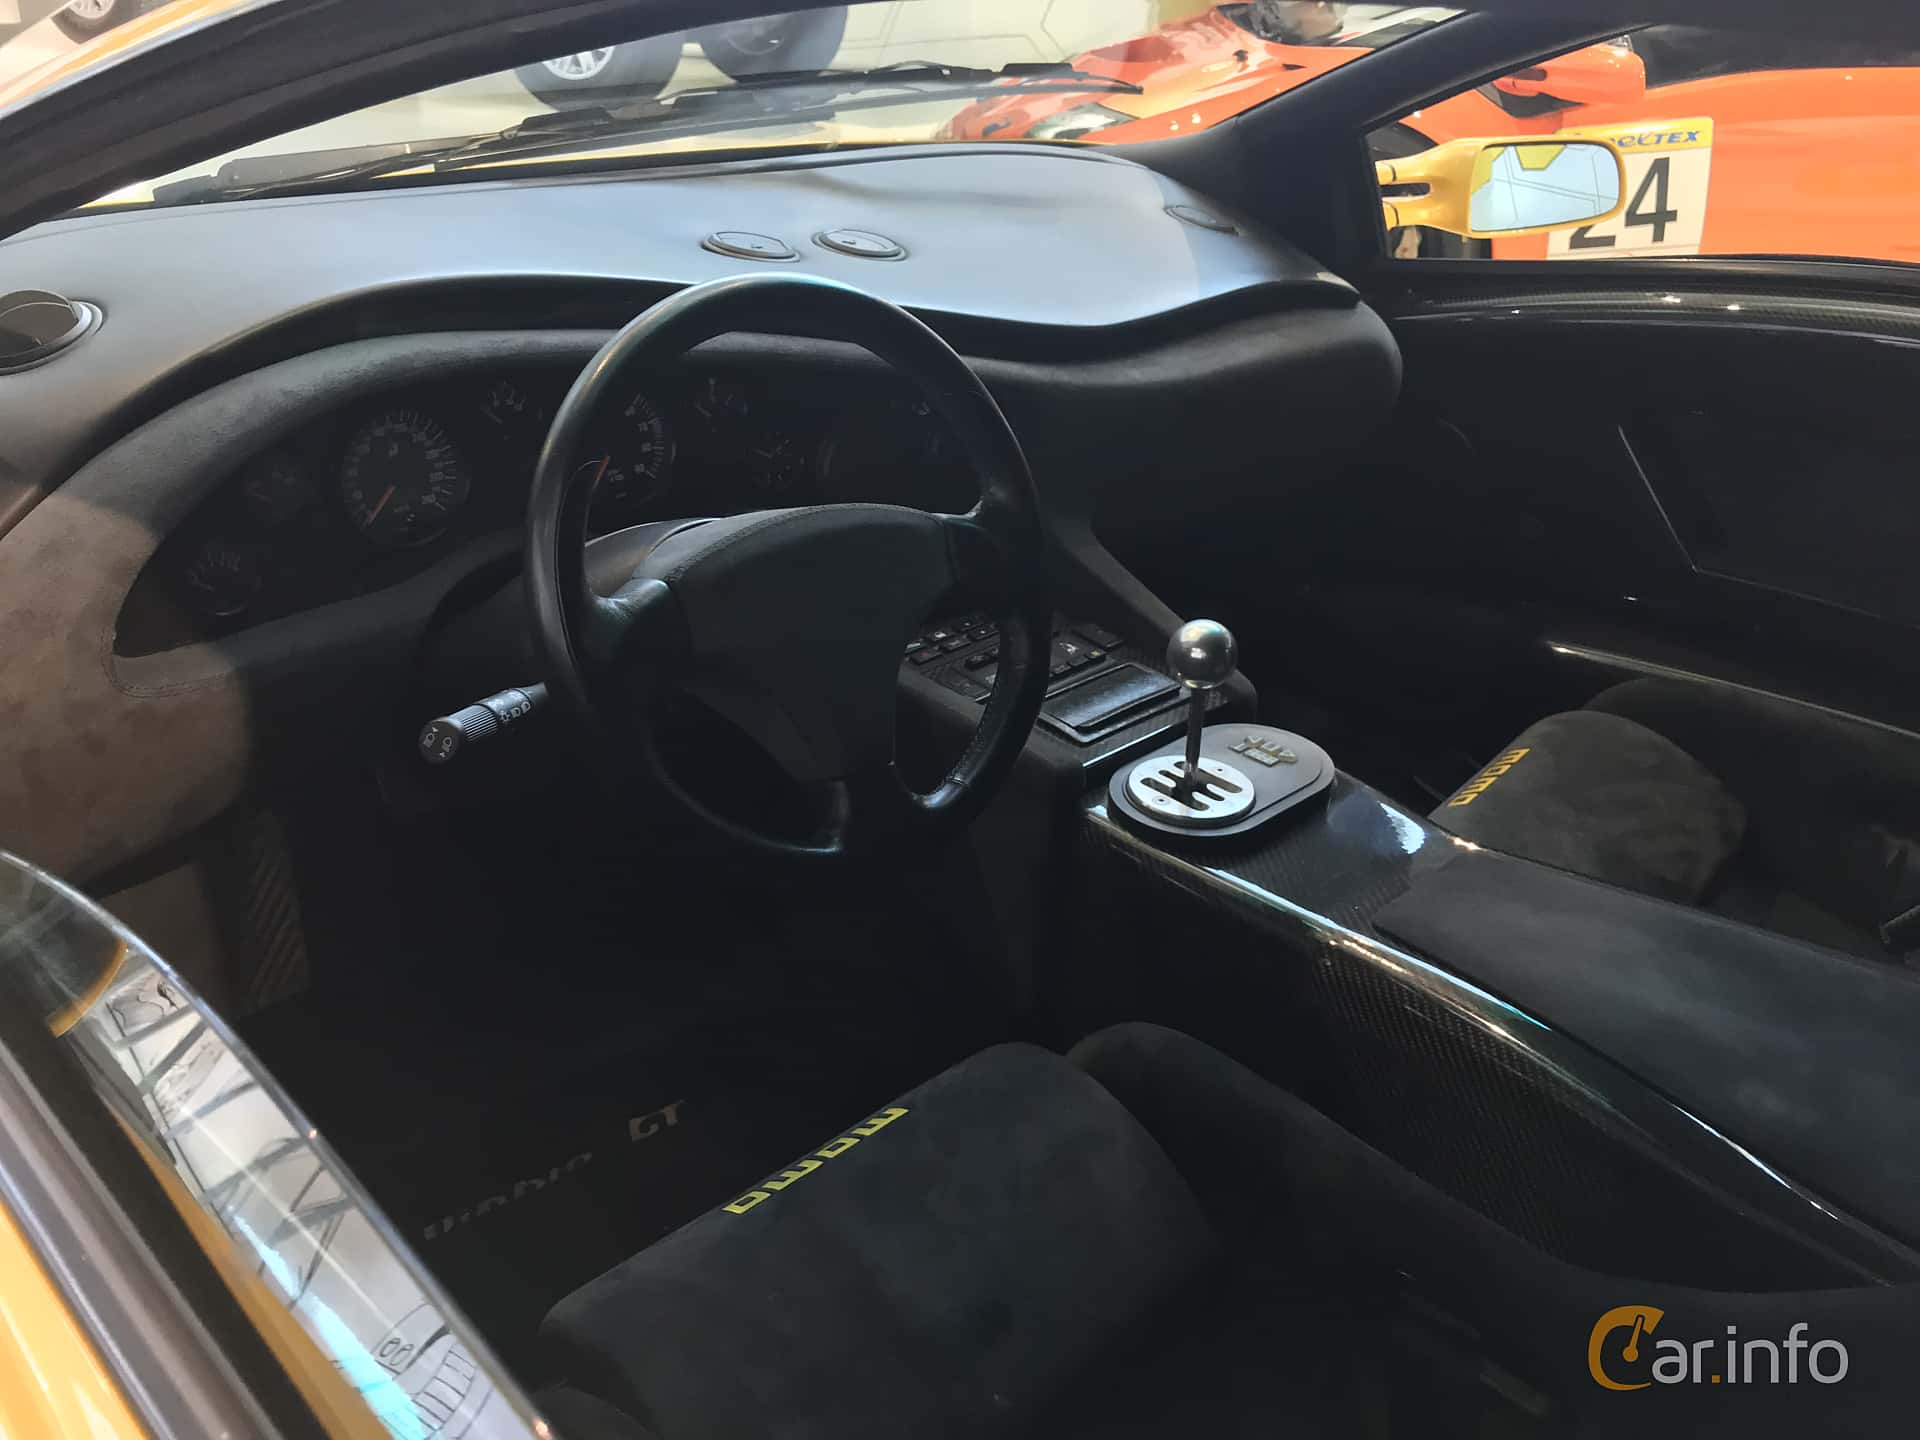 User Images Of Lamborghini Diablo 1st Generation Facelift